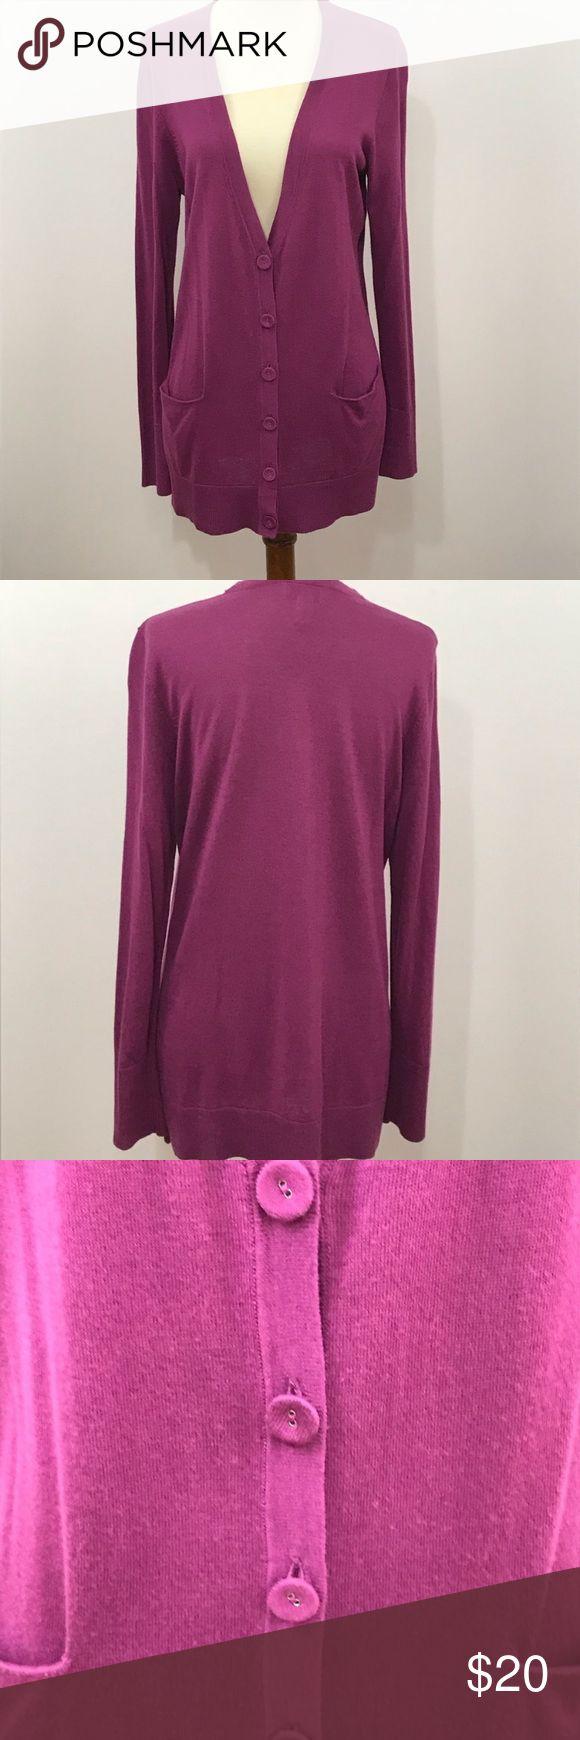 Ann Taylor Loft cardigan purple large petite work Ann Taylor Loft cardigan pocke…